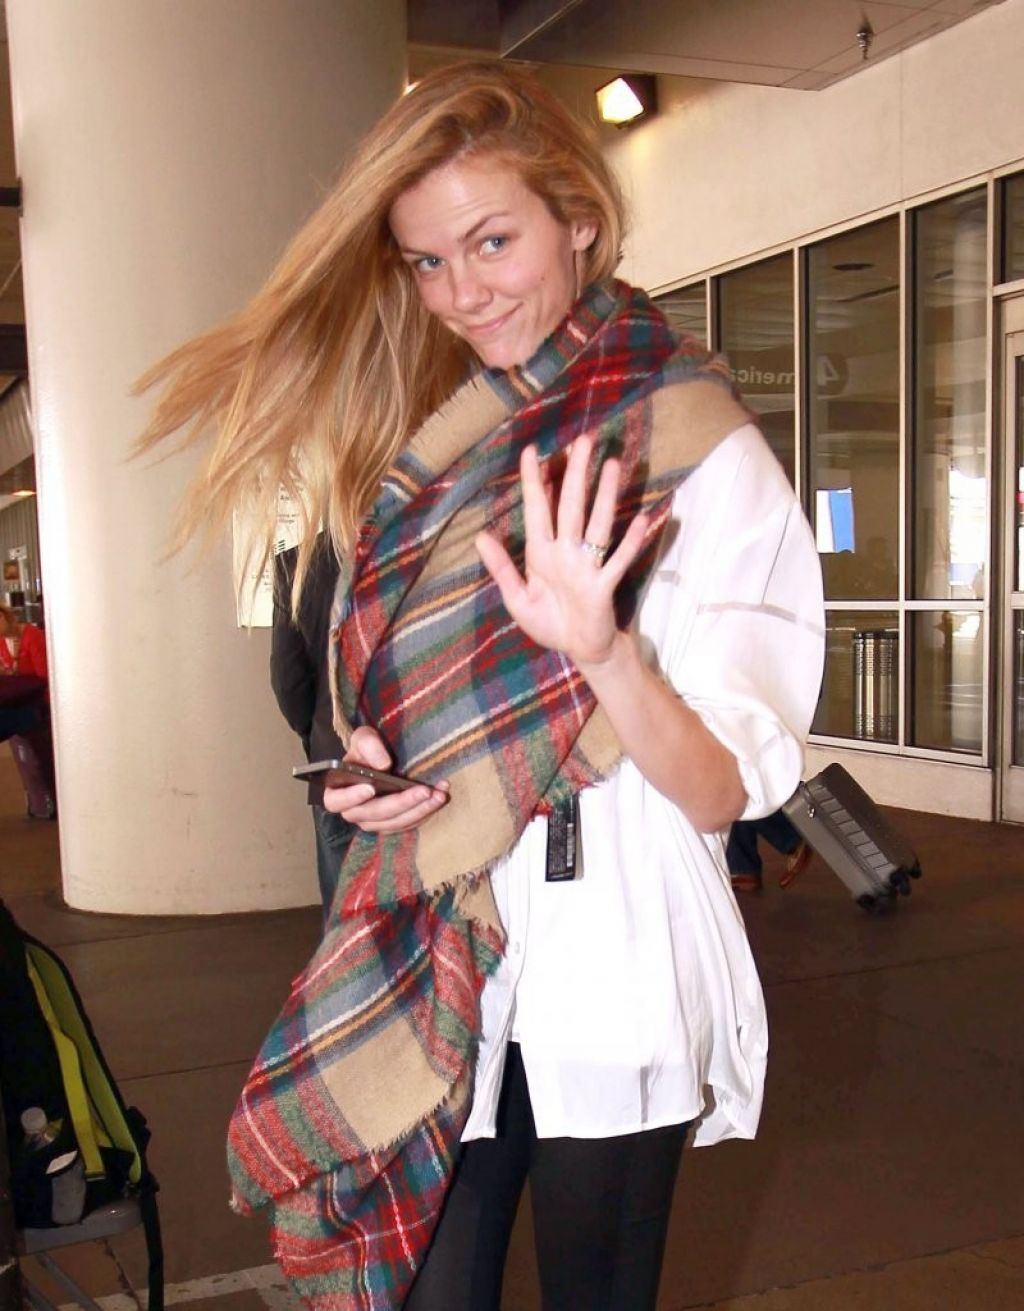 Brooklyn Decker at LAX Airport - March 2014